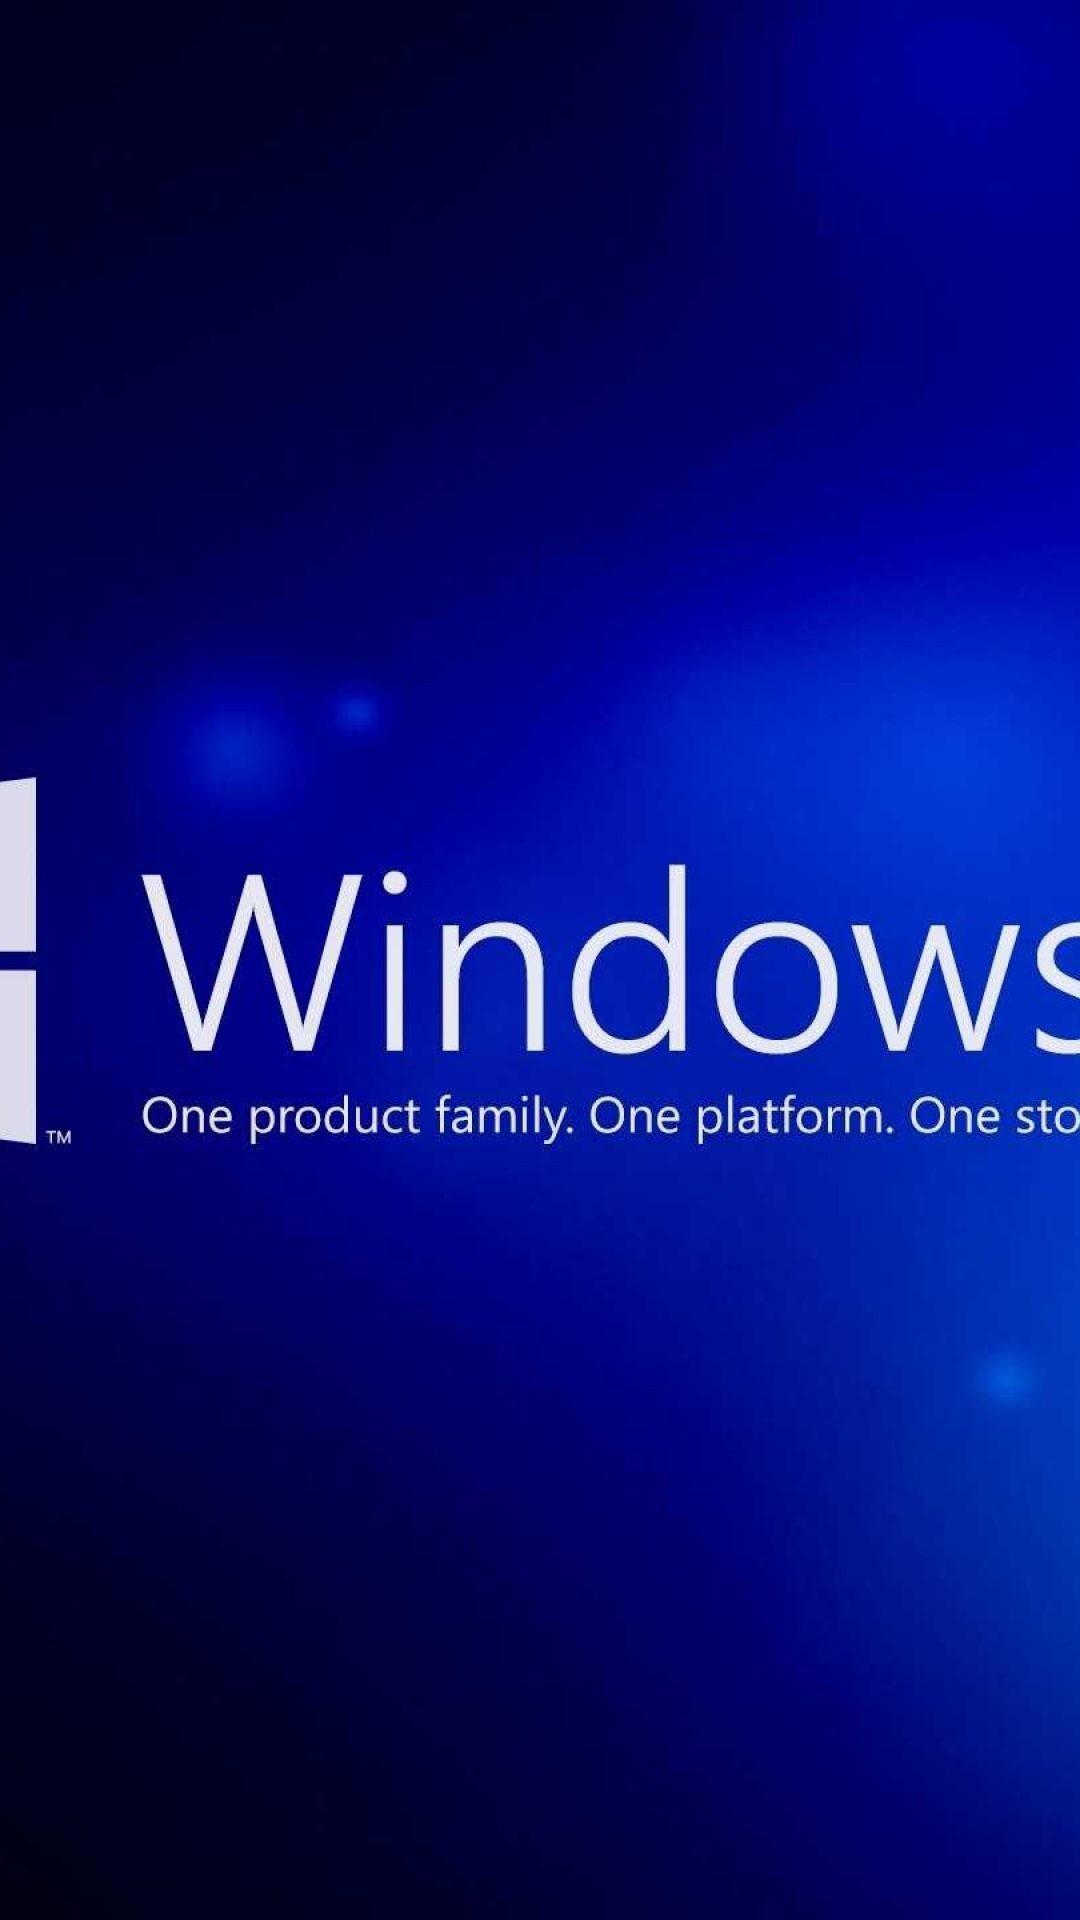 windows 10 wallpaper 2560×1440